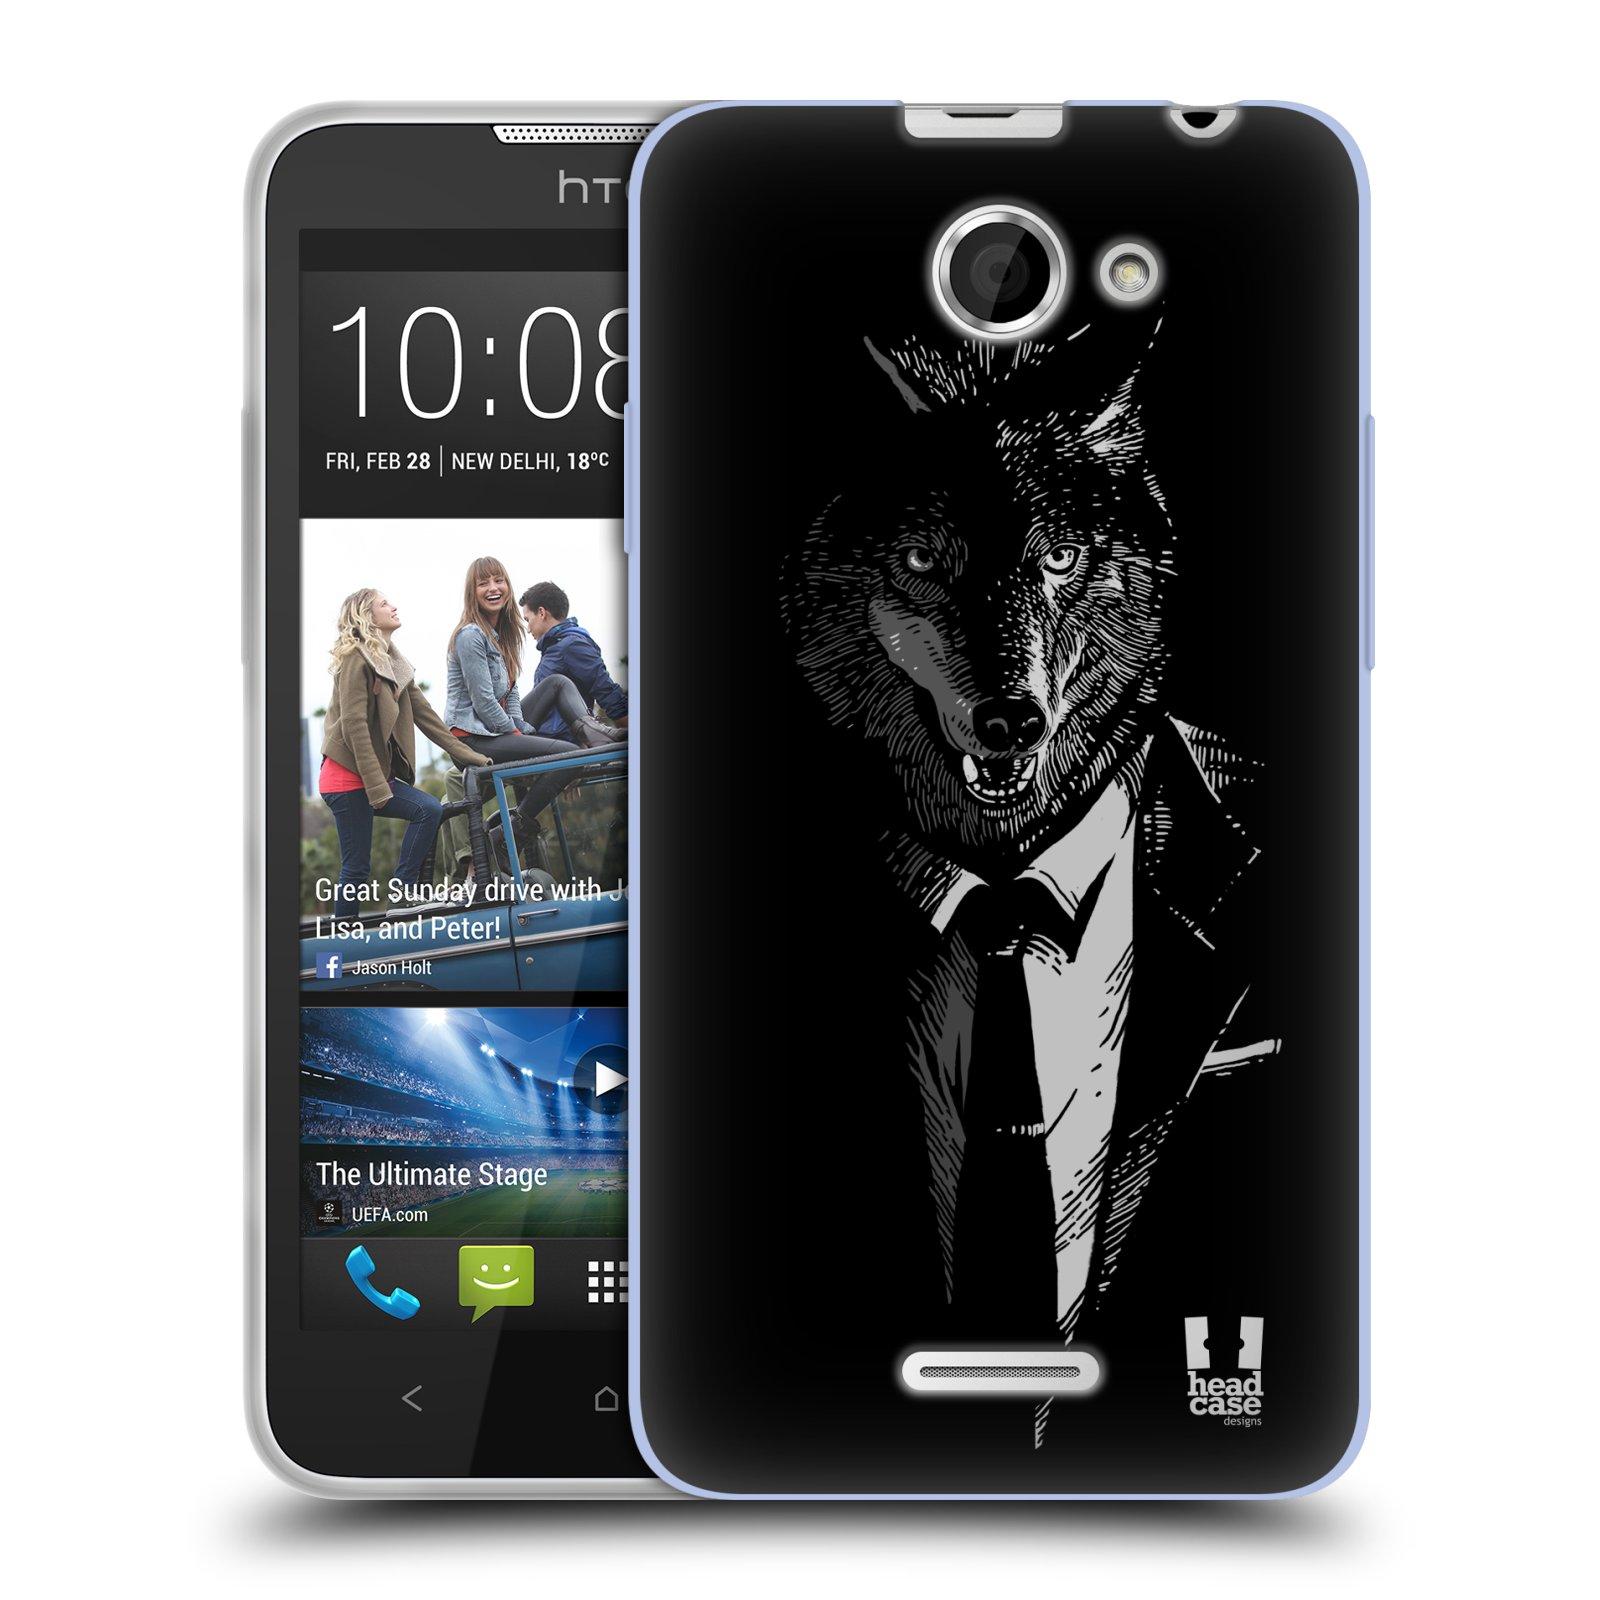 Silikonové pouzdro na mobil HTC Desire 516 HEAD CASE VLK V KVÁDRU (Silikonový kryt či obal na mobilní telefon HTC Desire 516 Dual SIM)